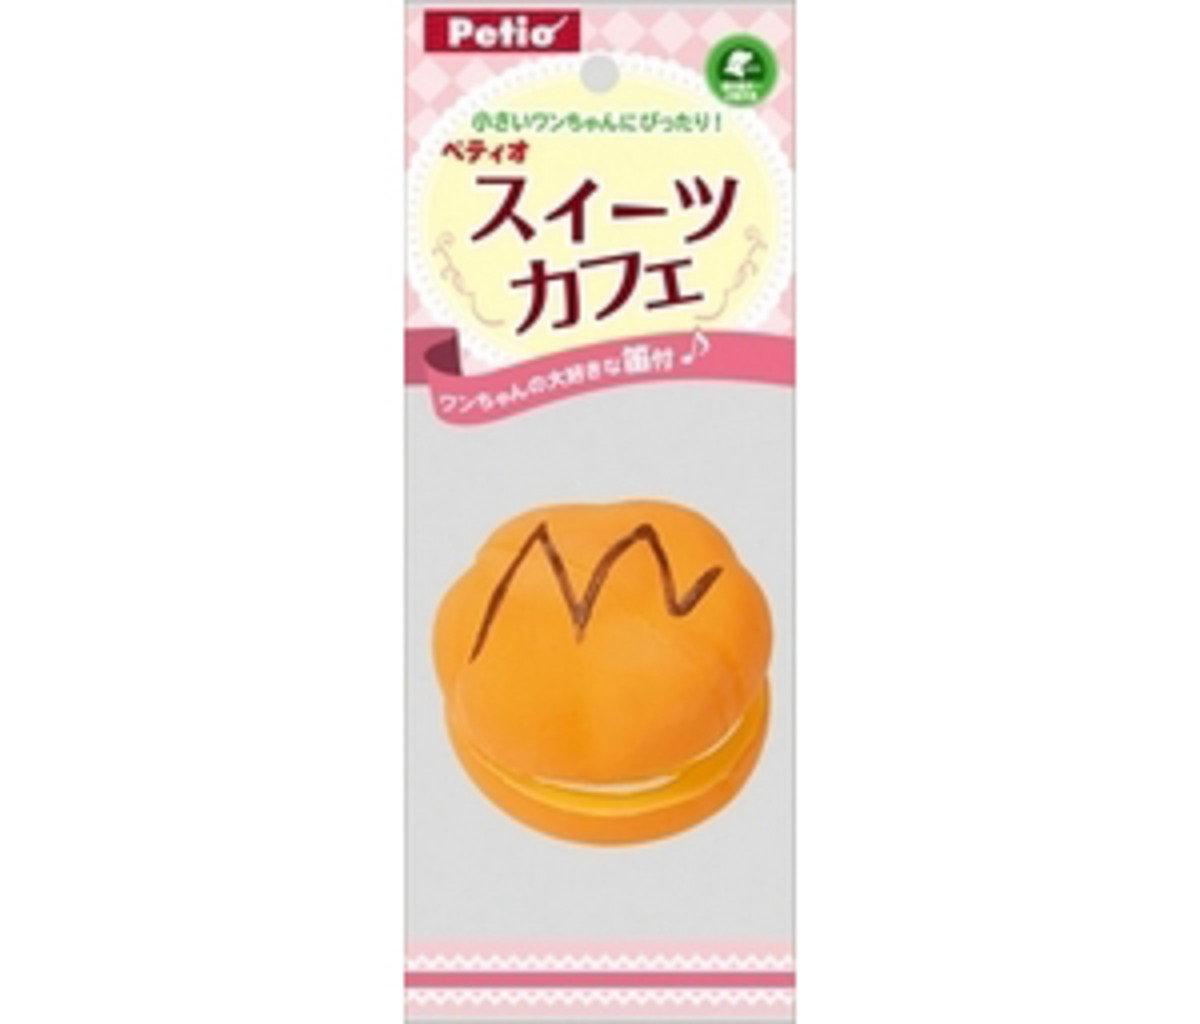 PO23427 日本 PETIO 發聲玩具 - 奶油泡夫